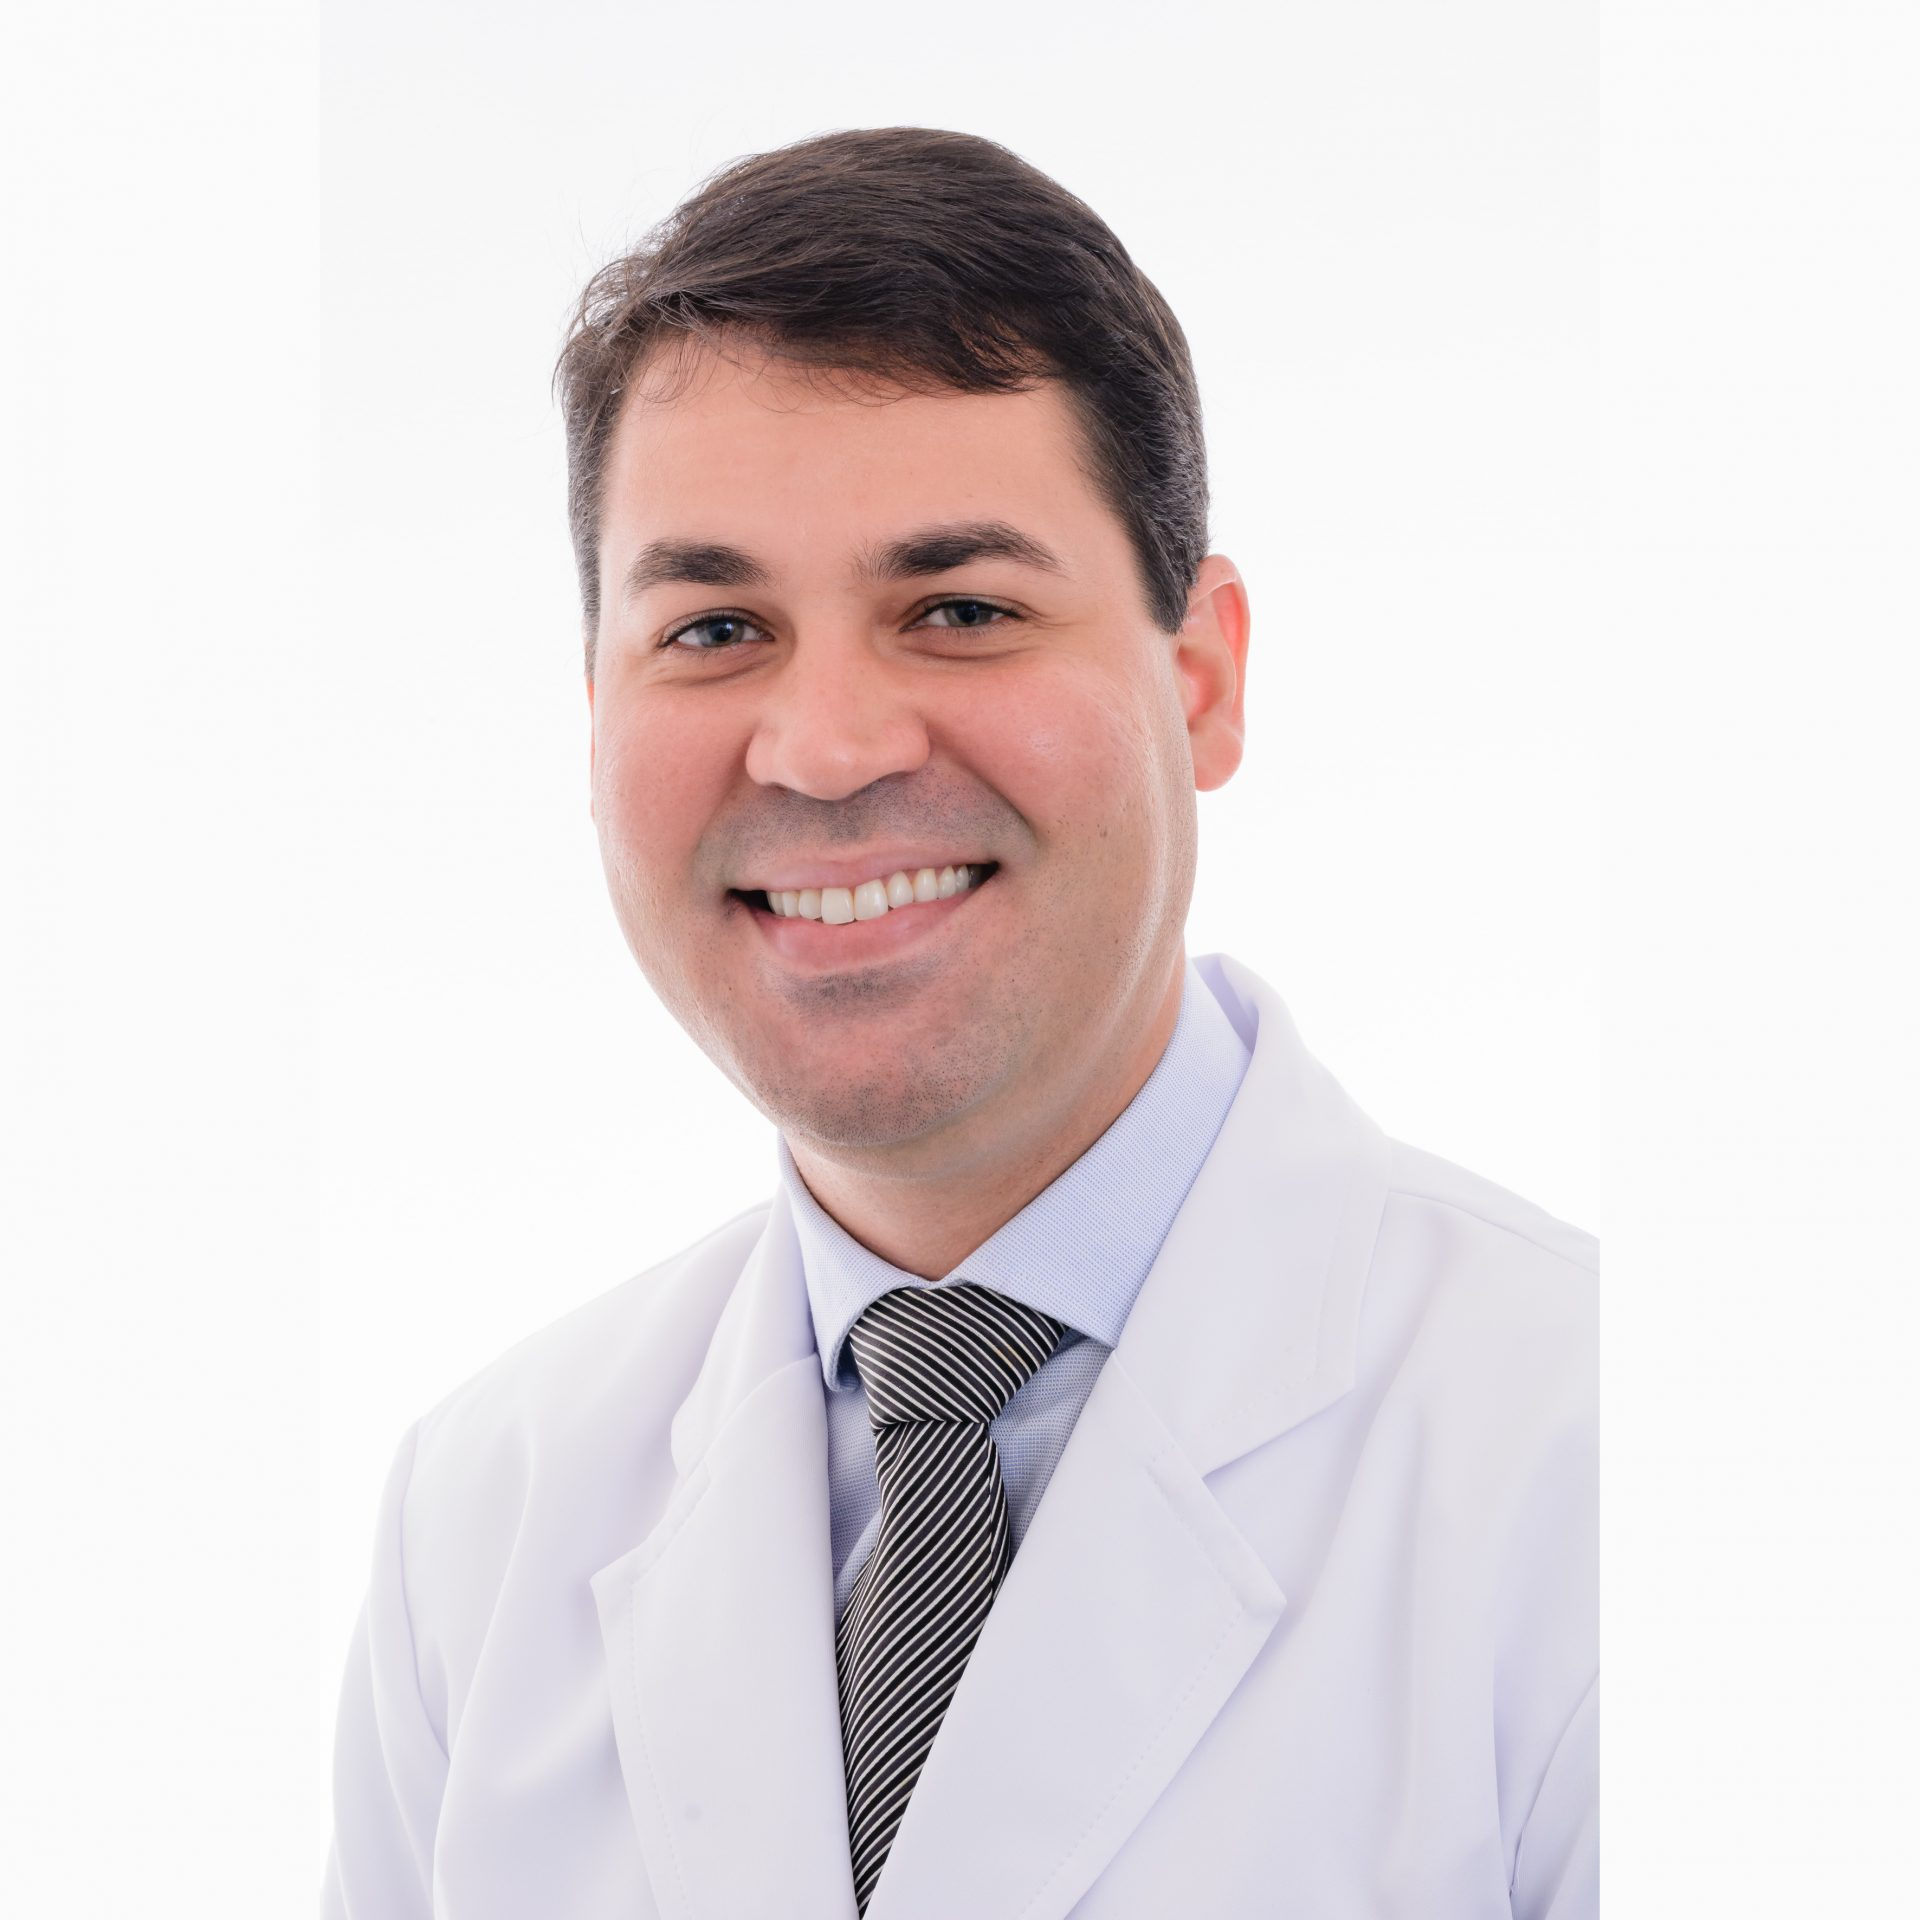 Dr. Filipe Baracho